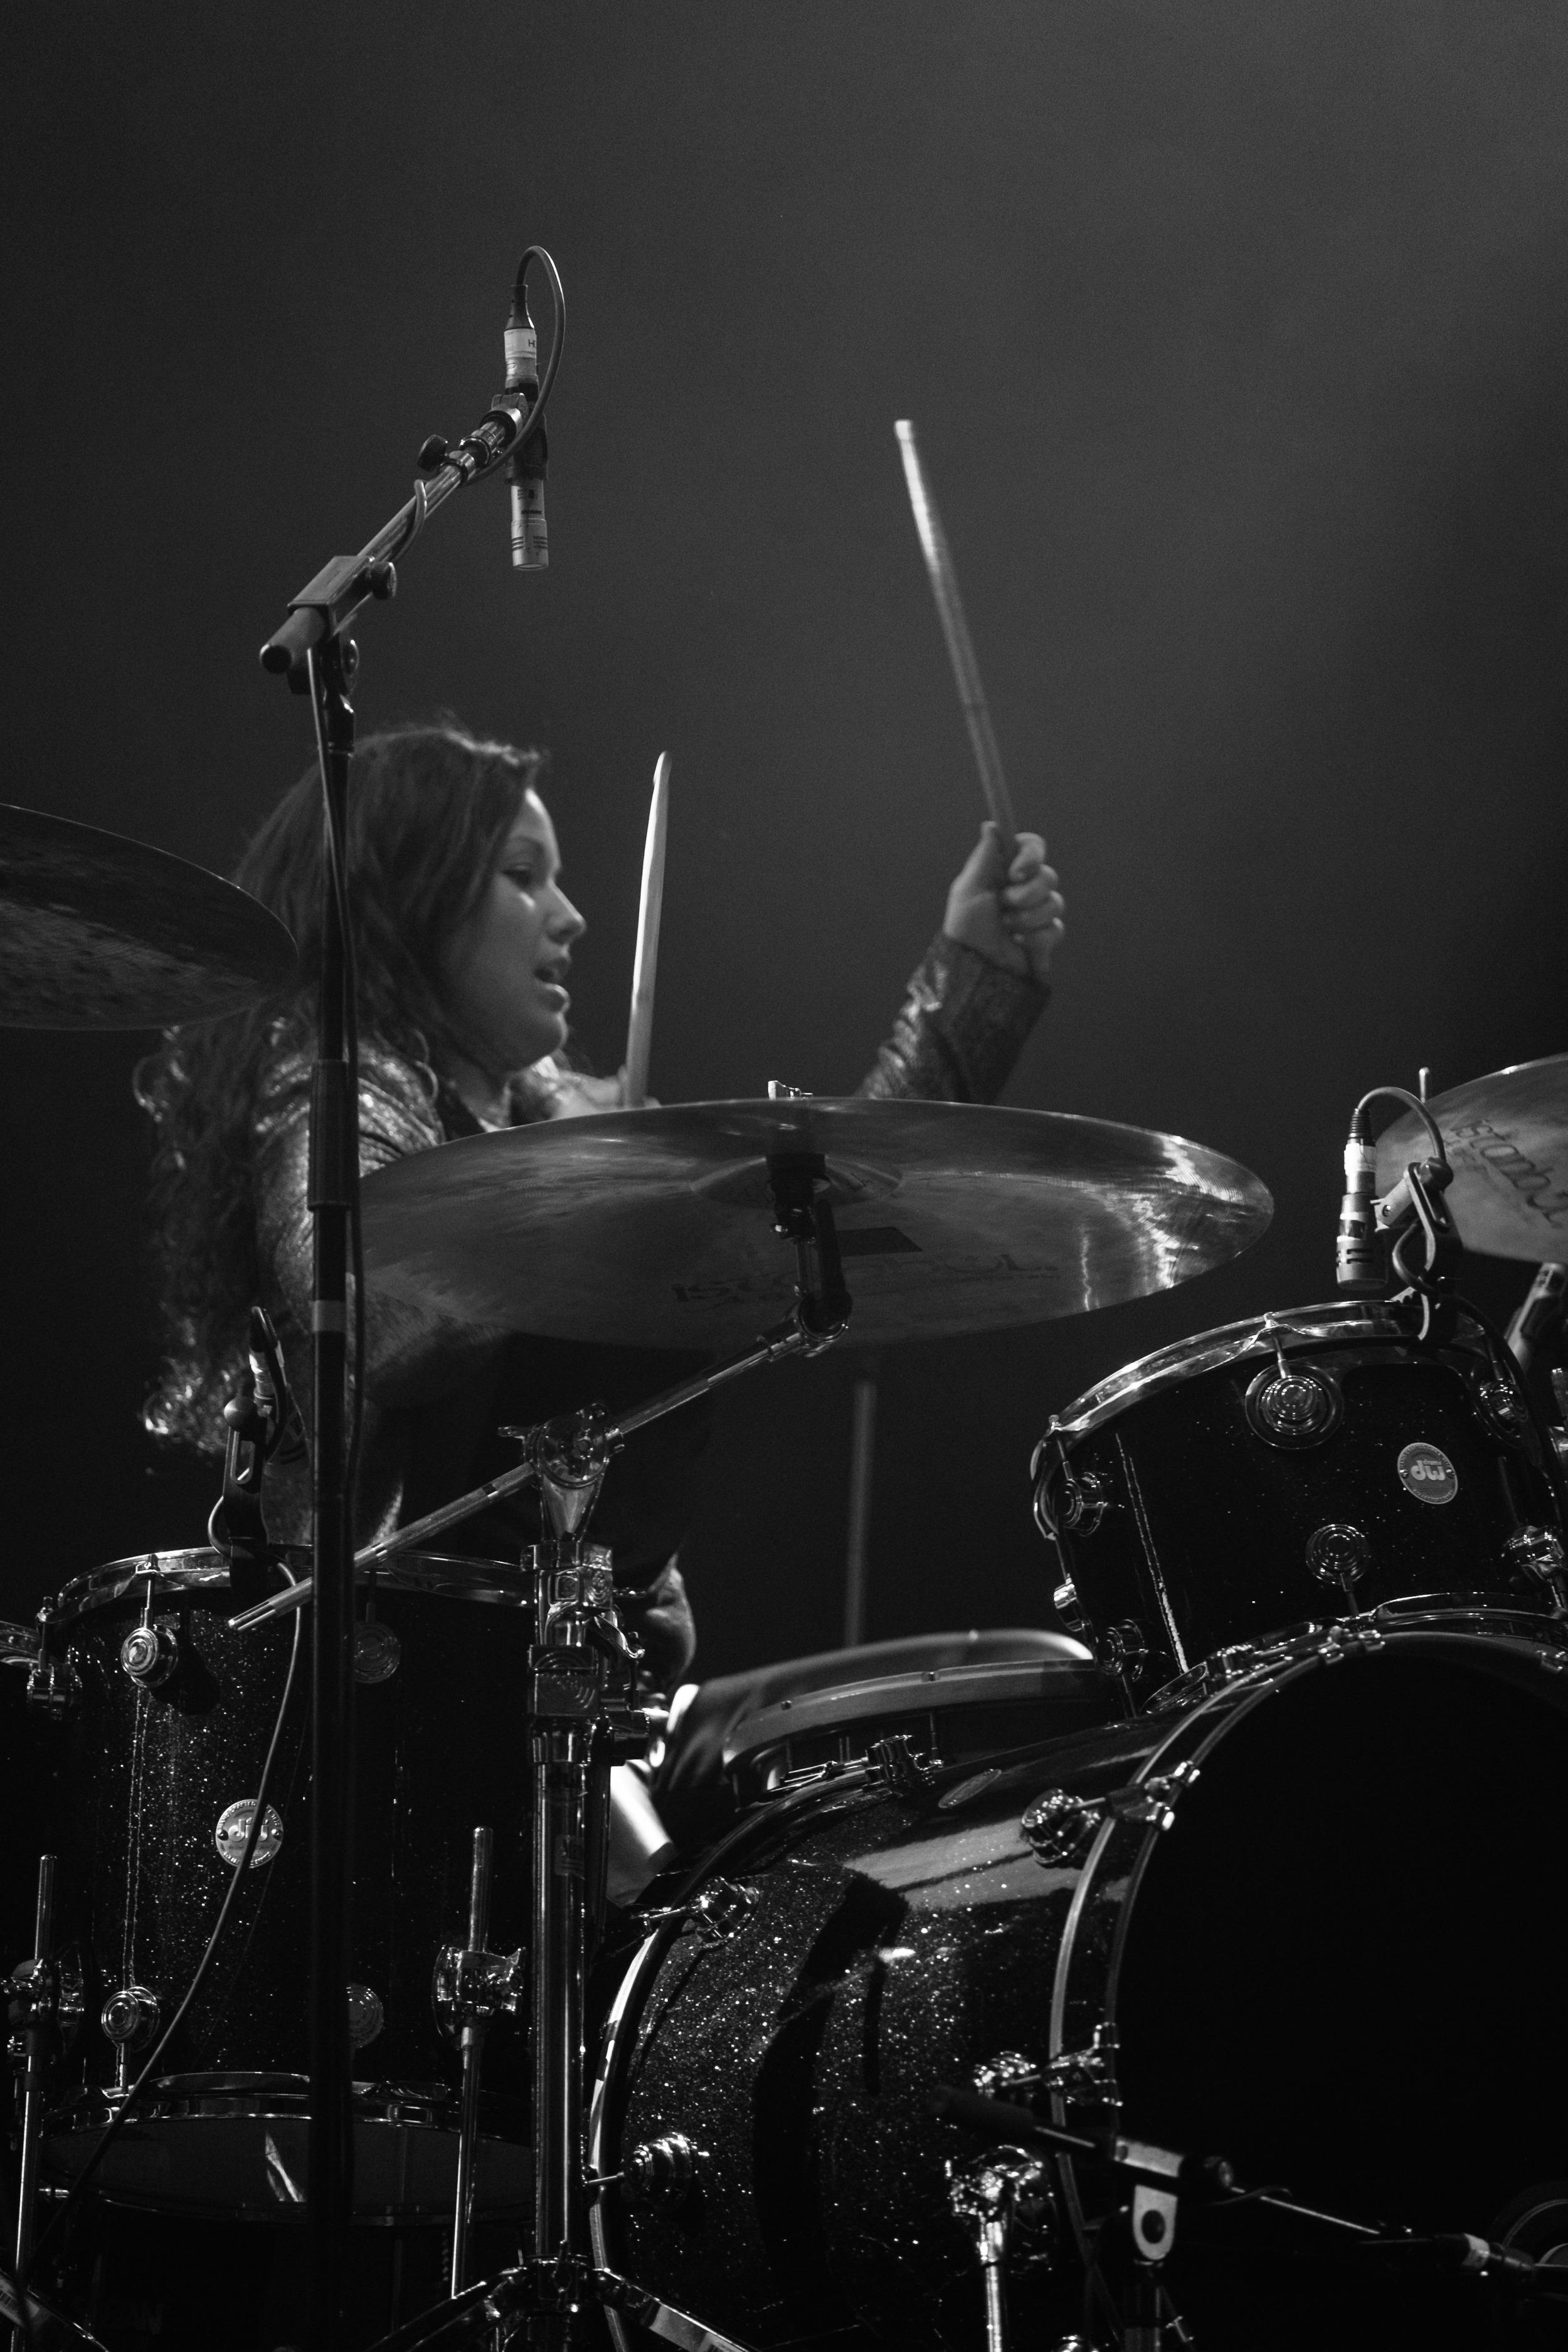 Rock_Worship_Roadshow-15.jpg